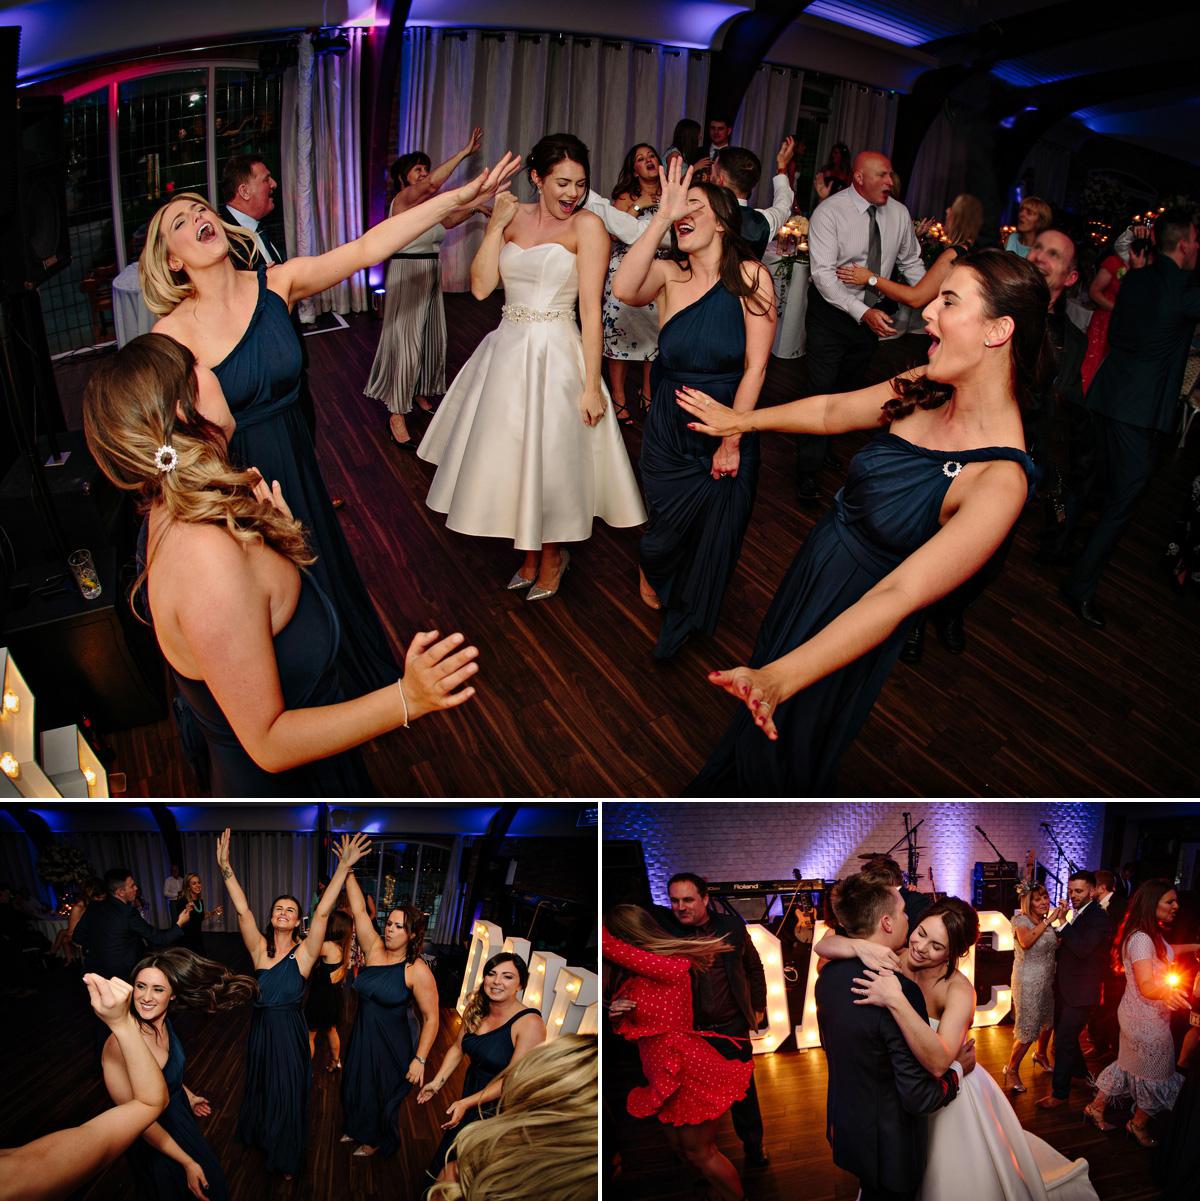 Bride and her Bridesmaids enjoying the evening dancing